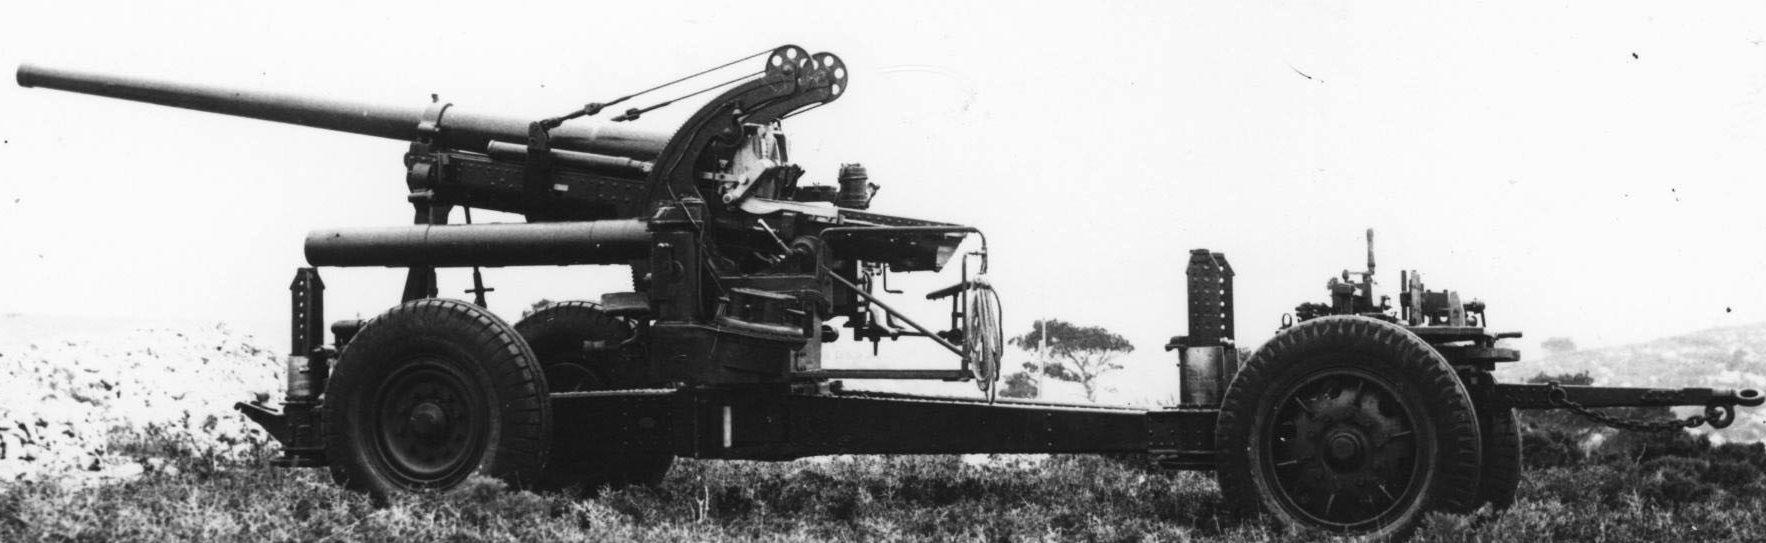 пушка 90-мм Mle 32 SM